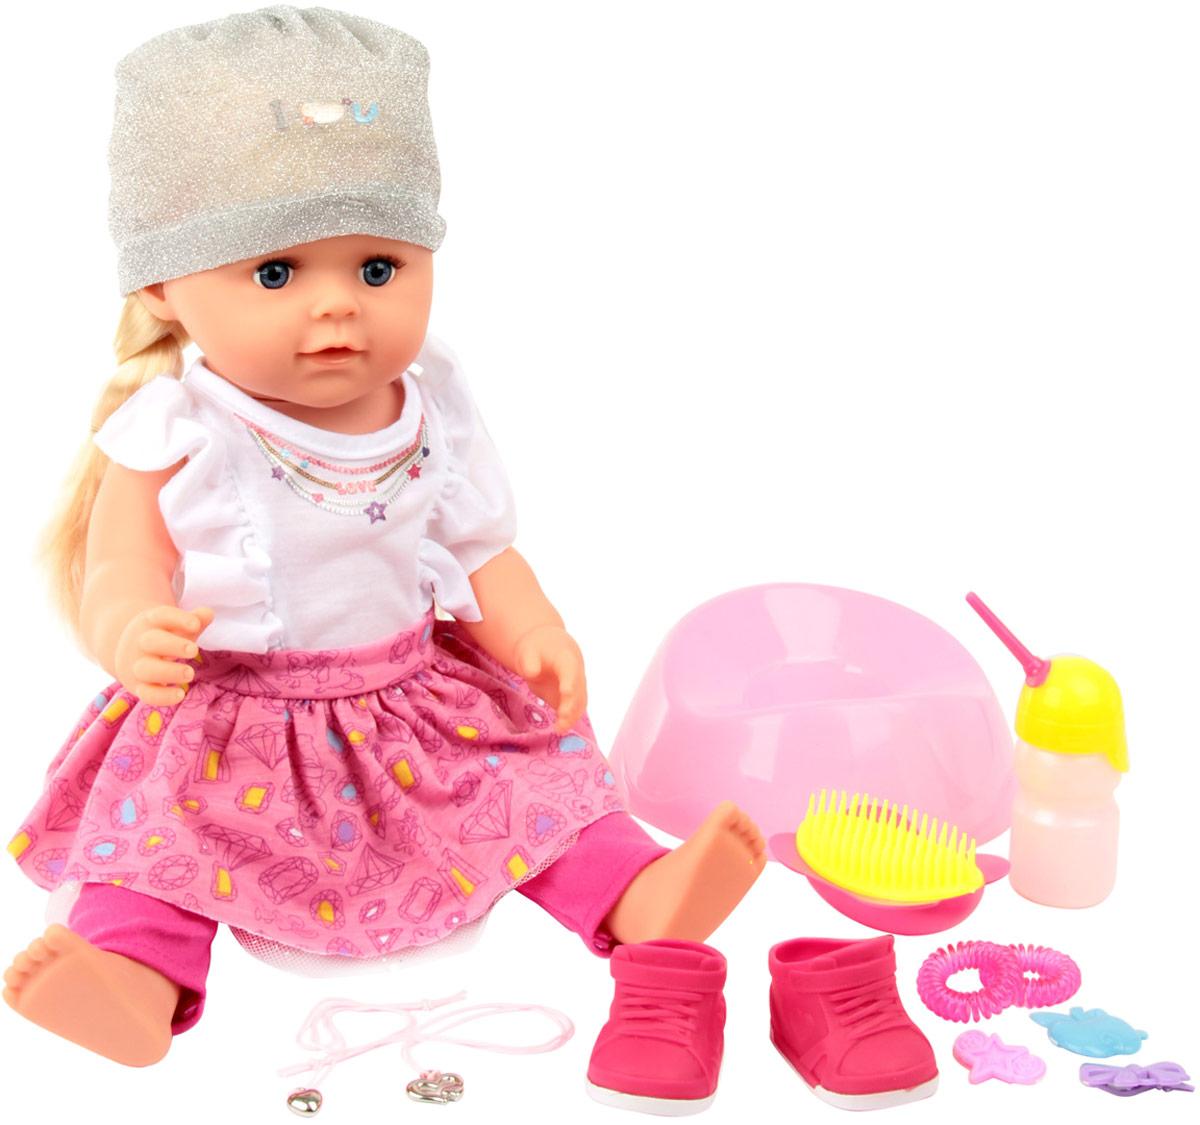 Lisa Jane Кукла Кира 46 см кукла lisa jane mami интерактивная в голубом 40 см